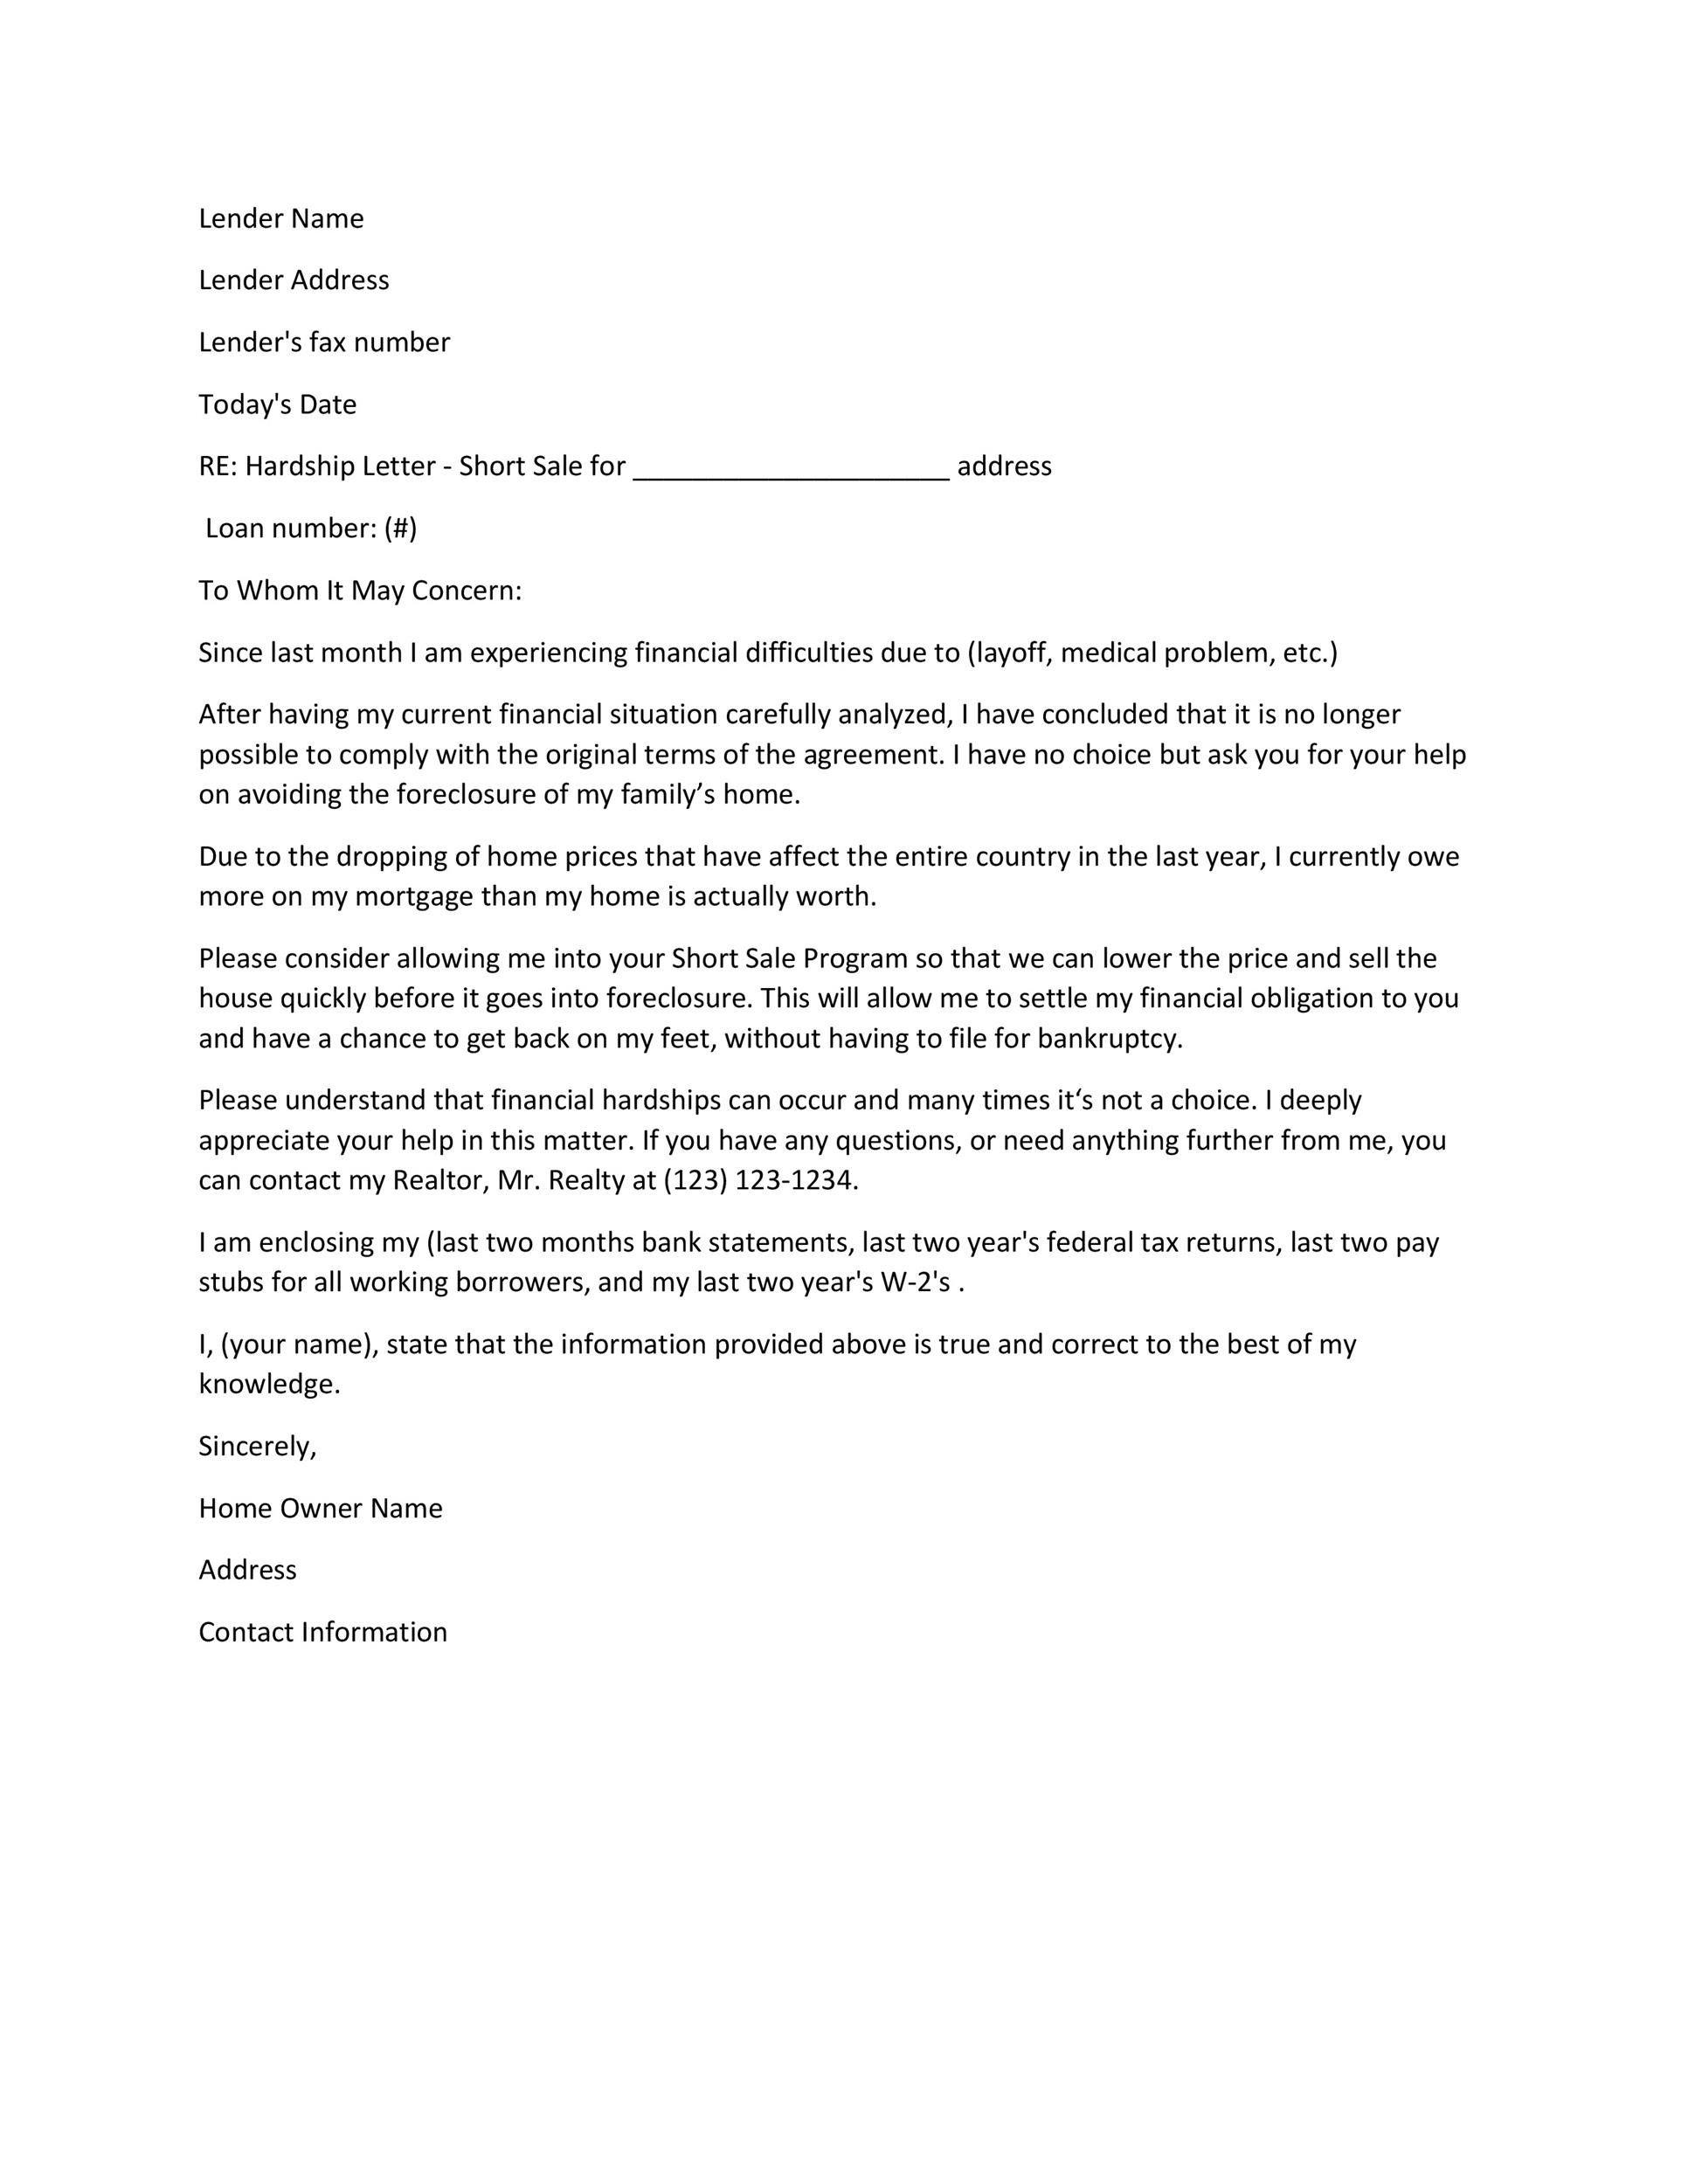 Hardship Letter For Mortgage Lettering Introduction Letter For Job Letter Example